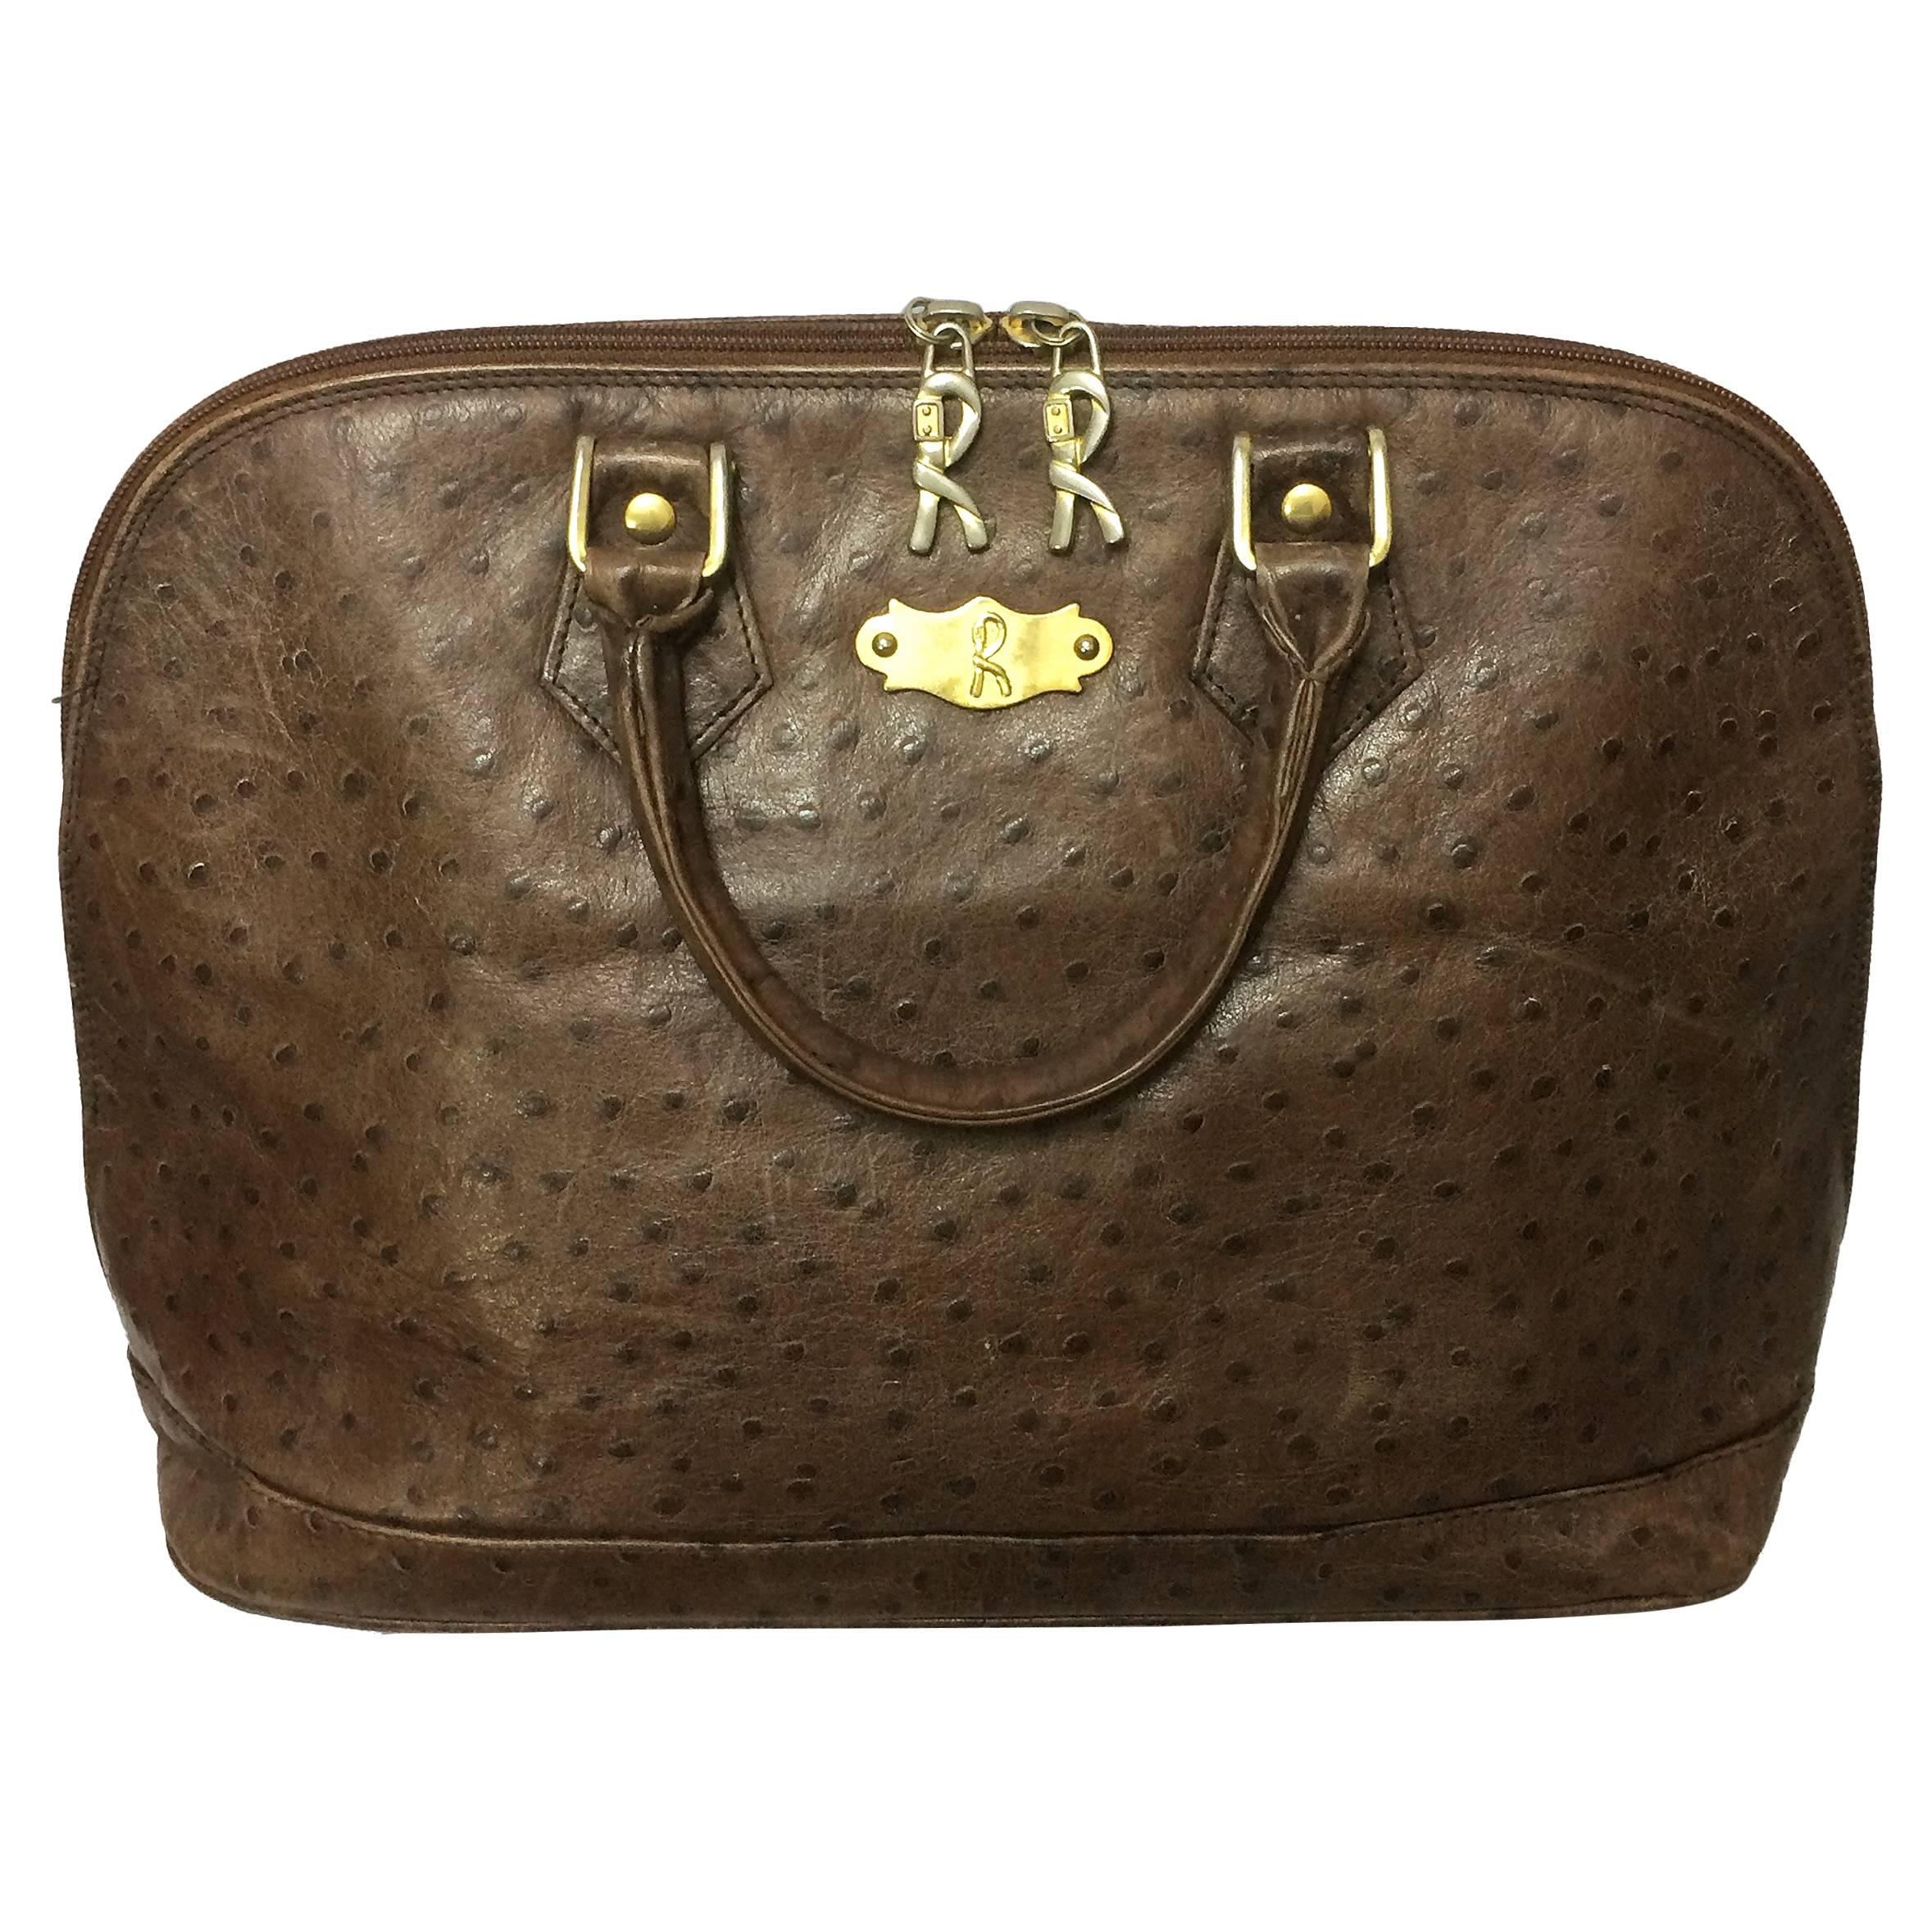 1stdibs Saks Fifth Avenue Striped Velvet Handbag Made In Italy 3KDO3FdT